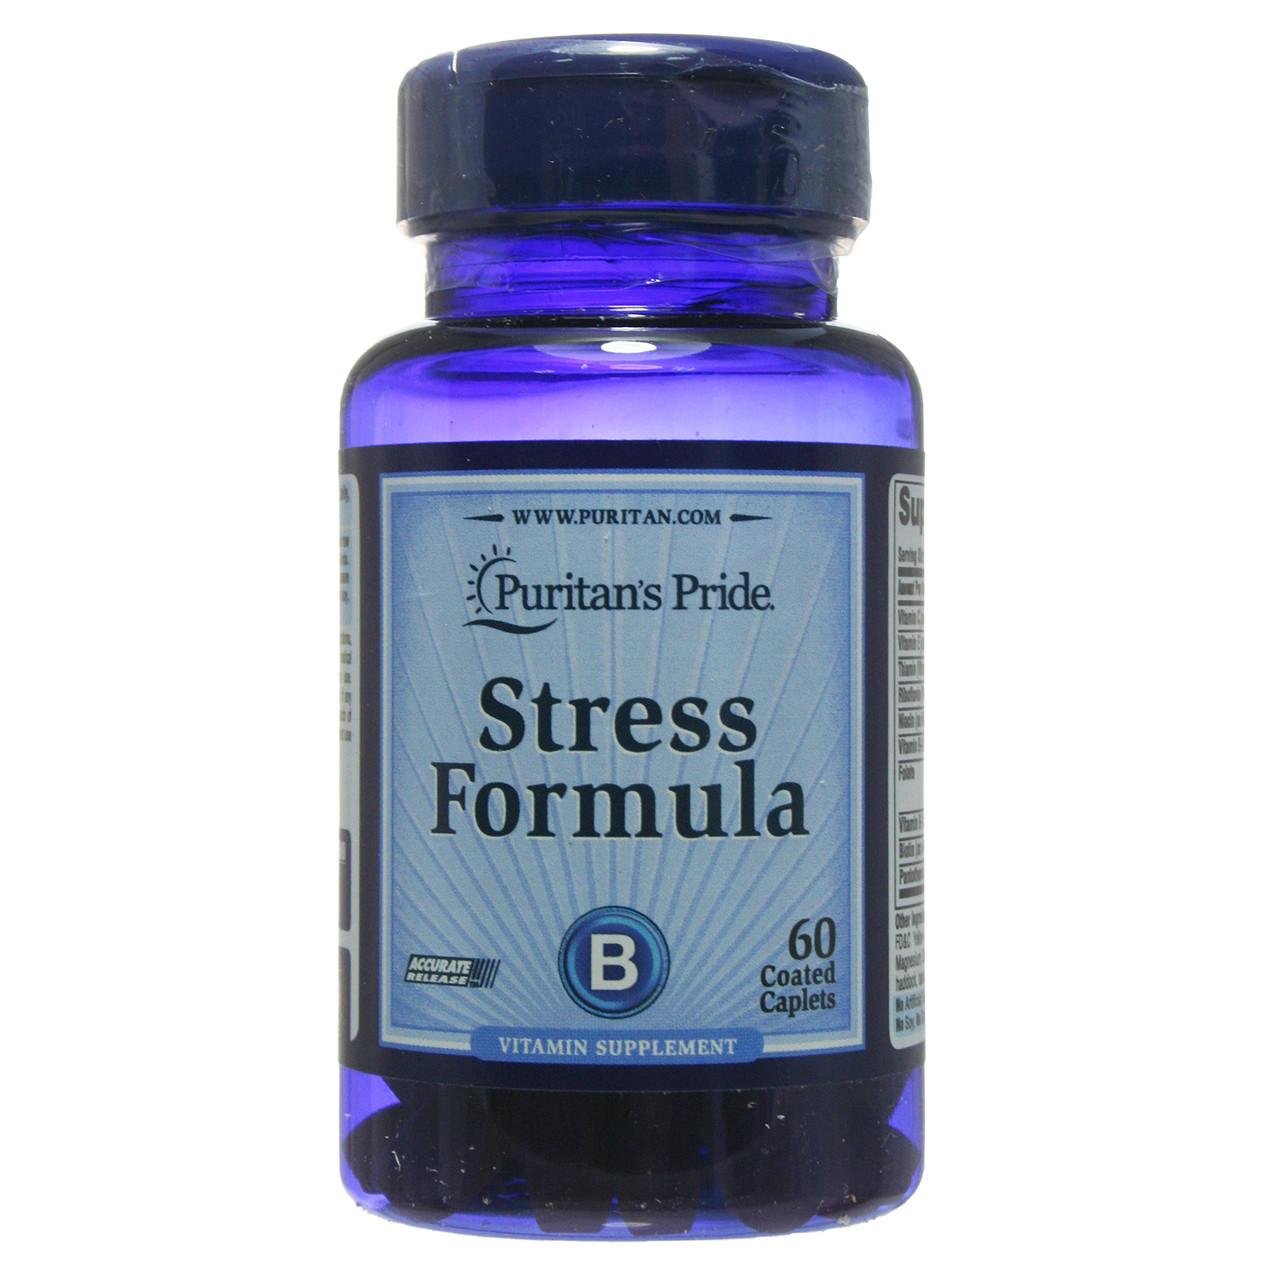 Стресс формула, Stress Formula, Puritan's Pride, 60 таблеток